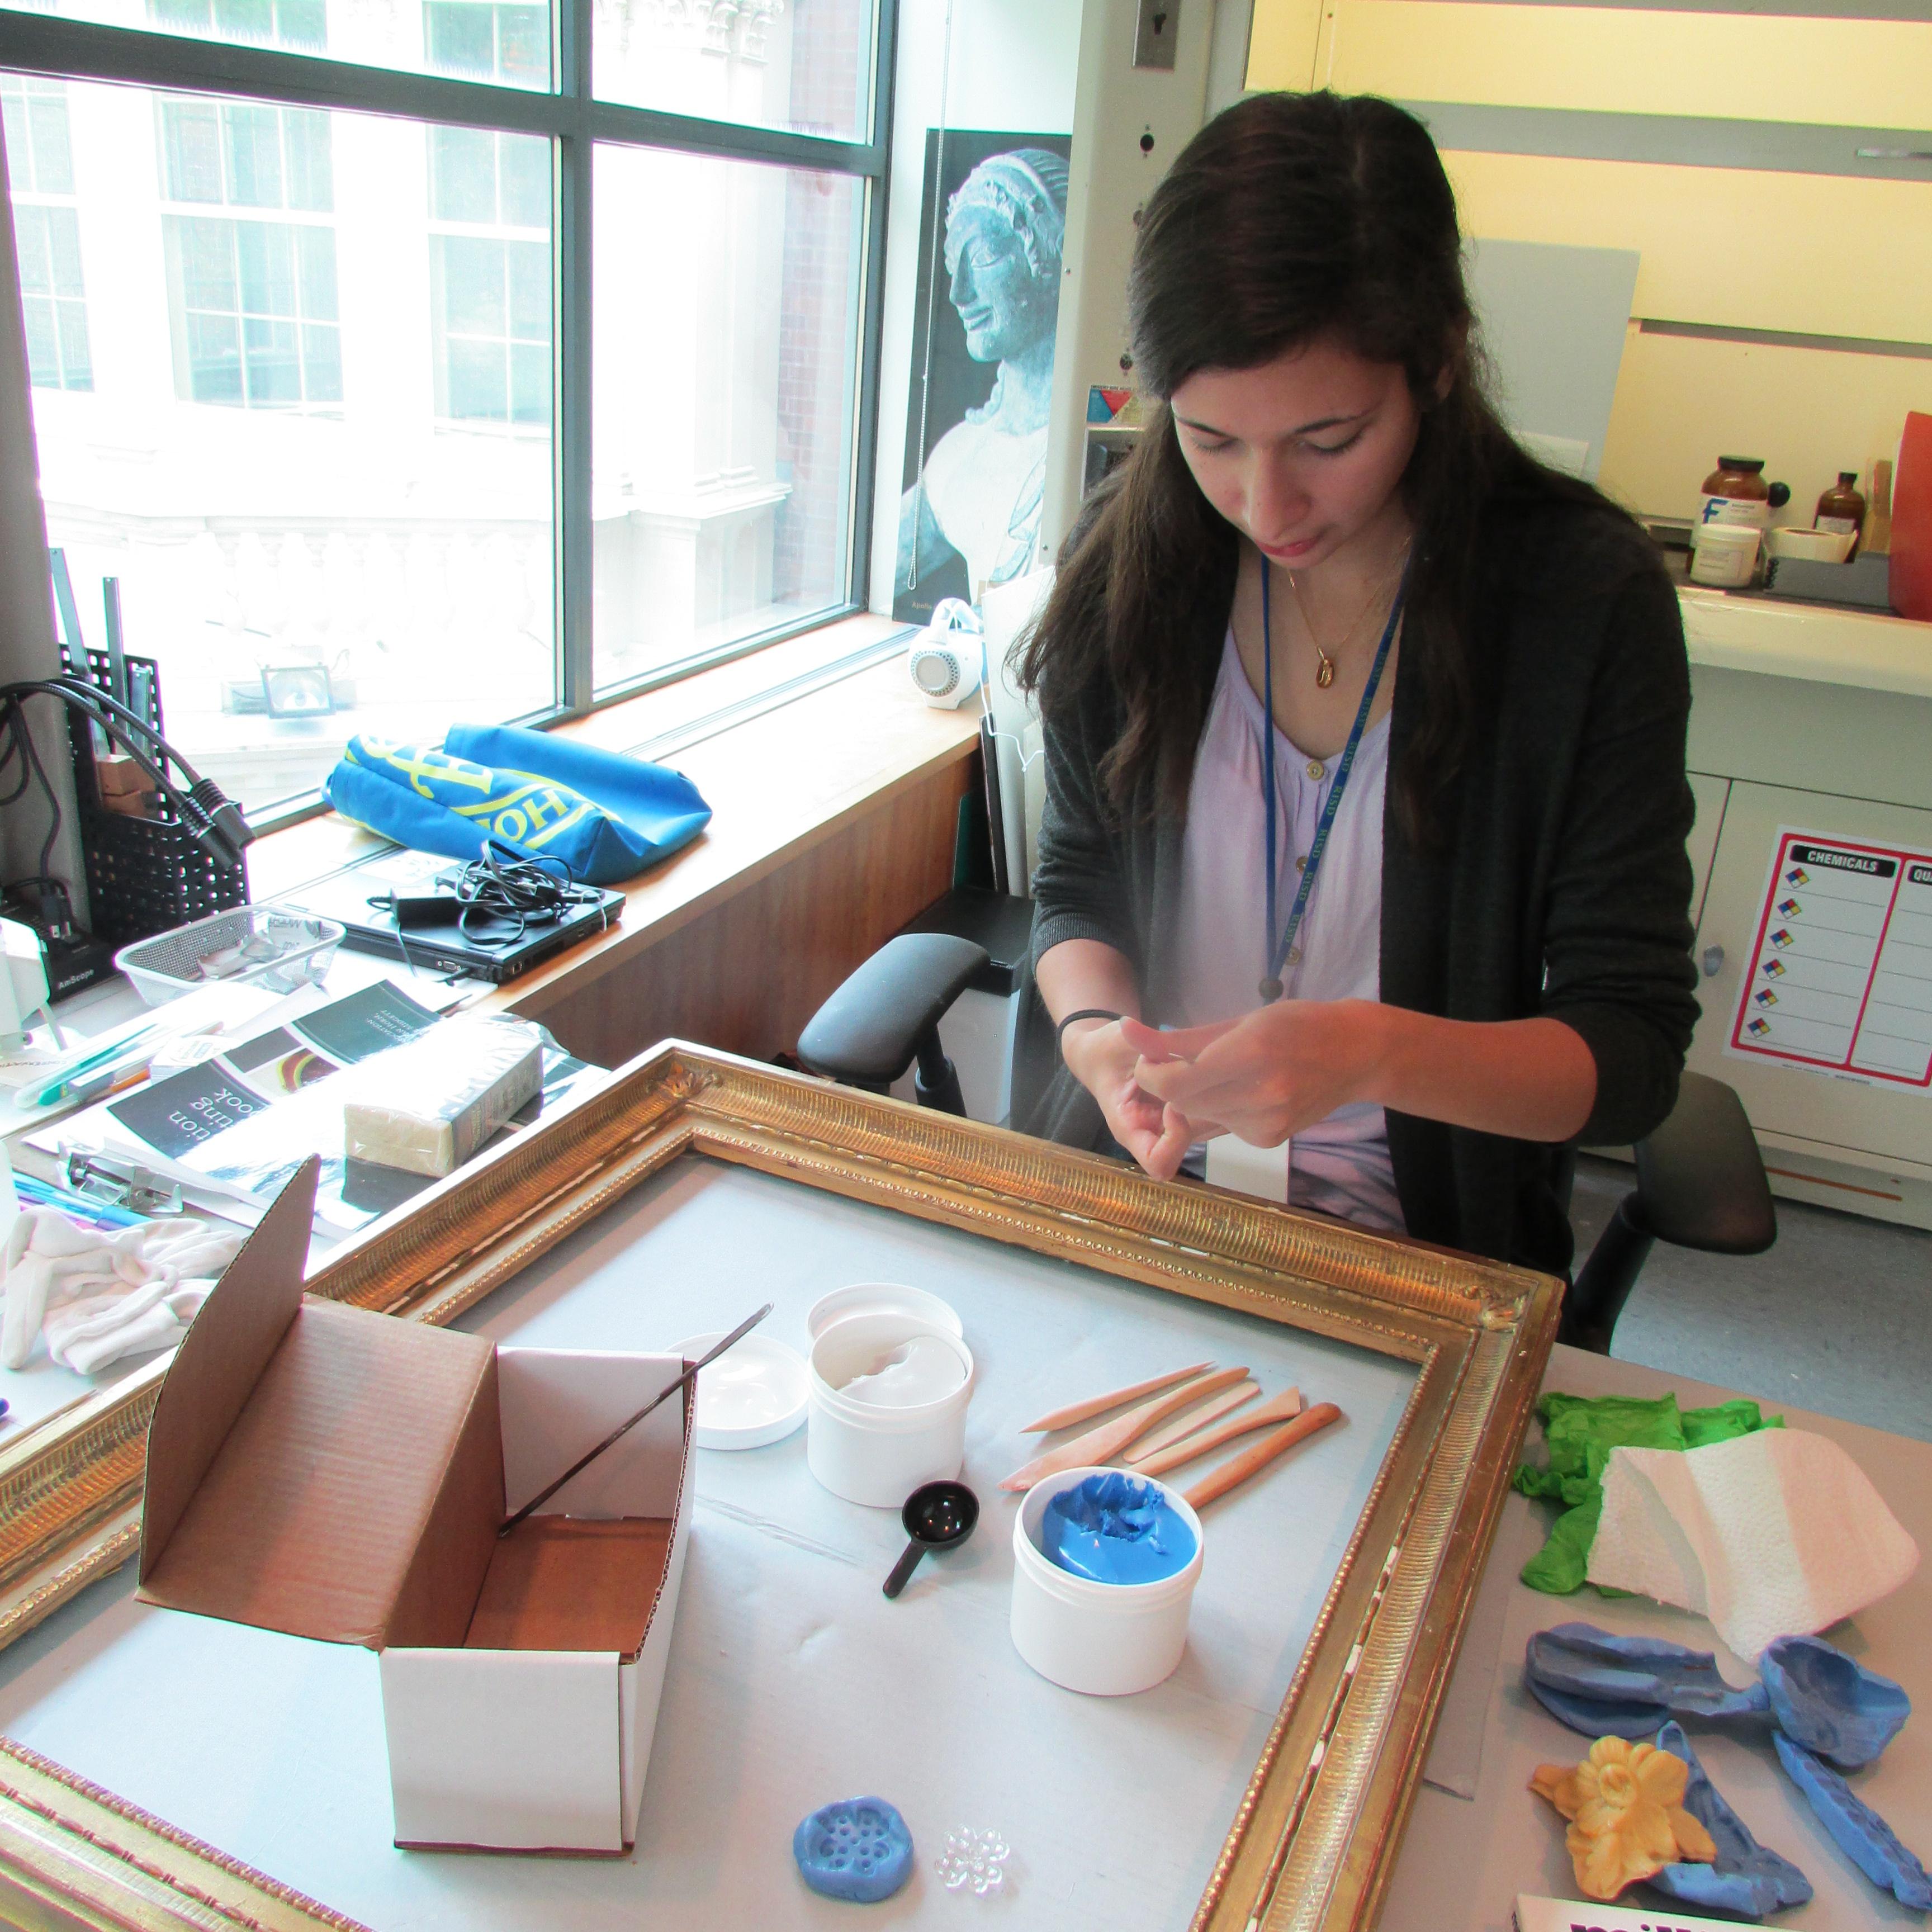 Erin Hein restores a frame during her internship at the RISD Museum Conservation Department.